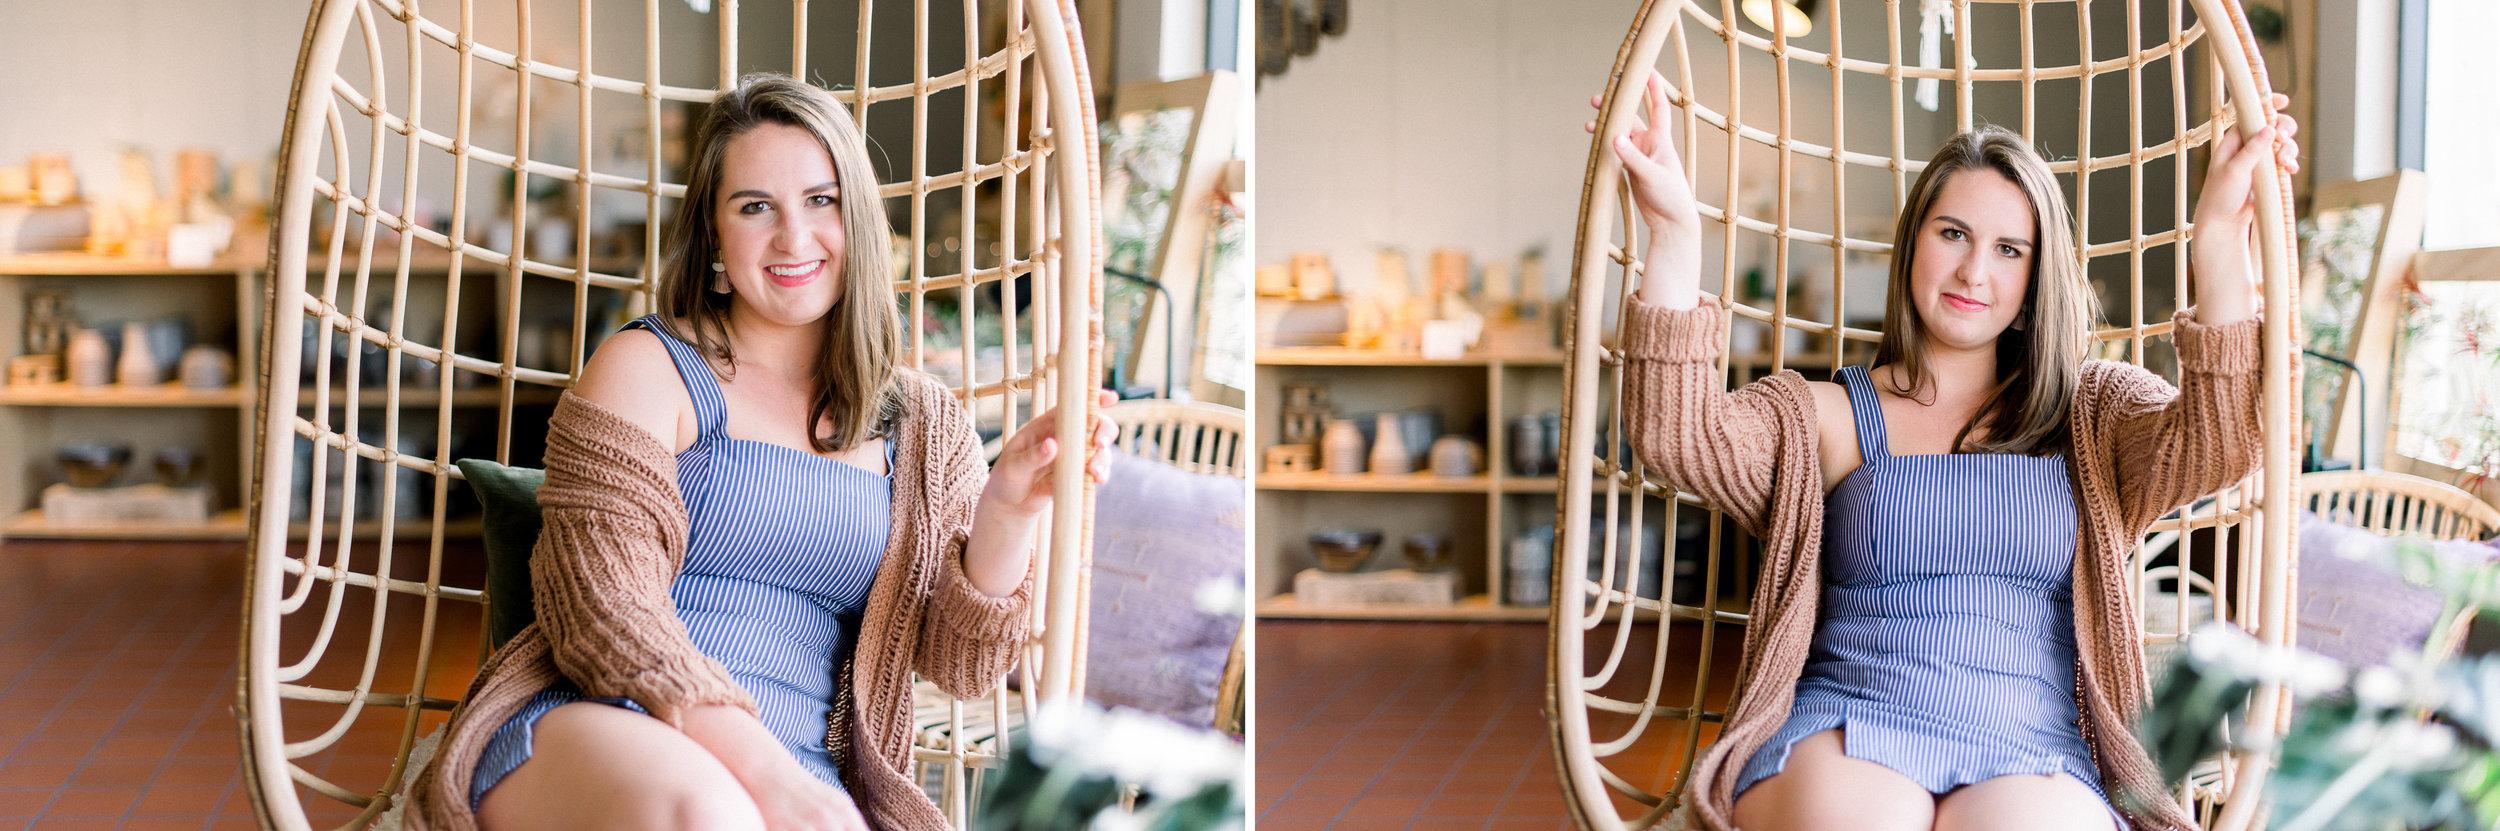 KateTaramykinStudios-Rollins-College-Grad-Portraits-Kristine-2.jpg